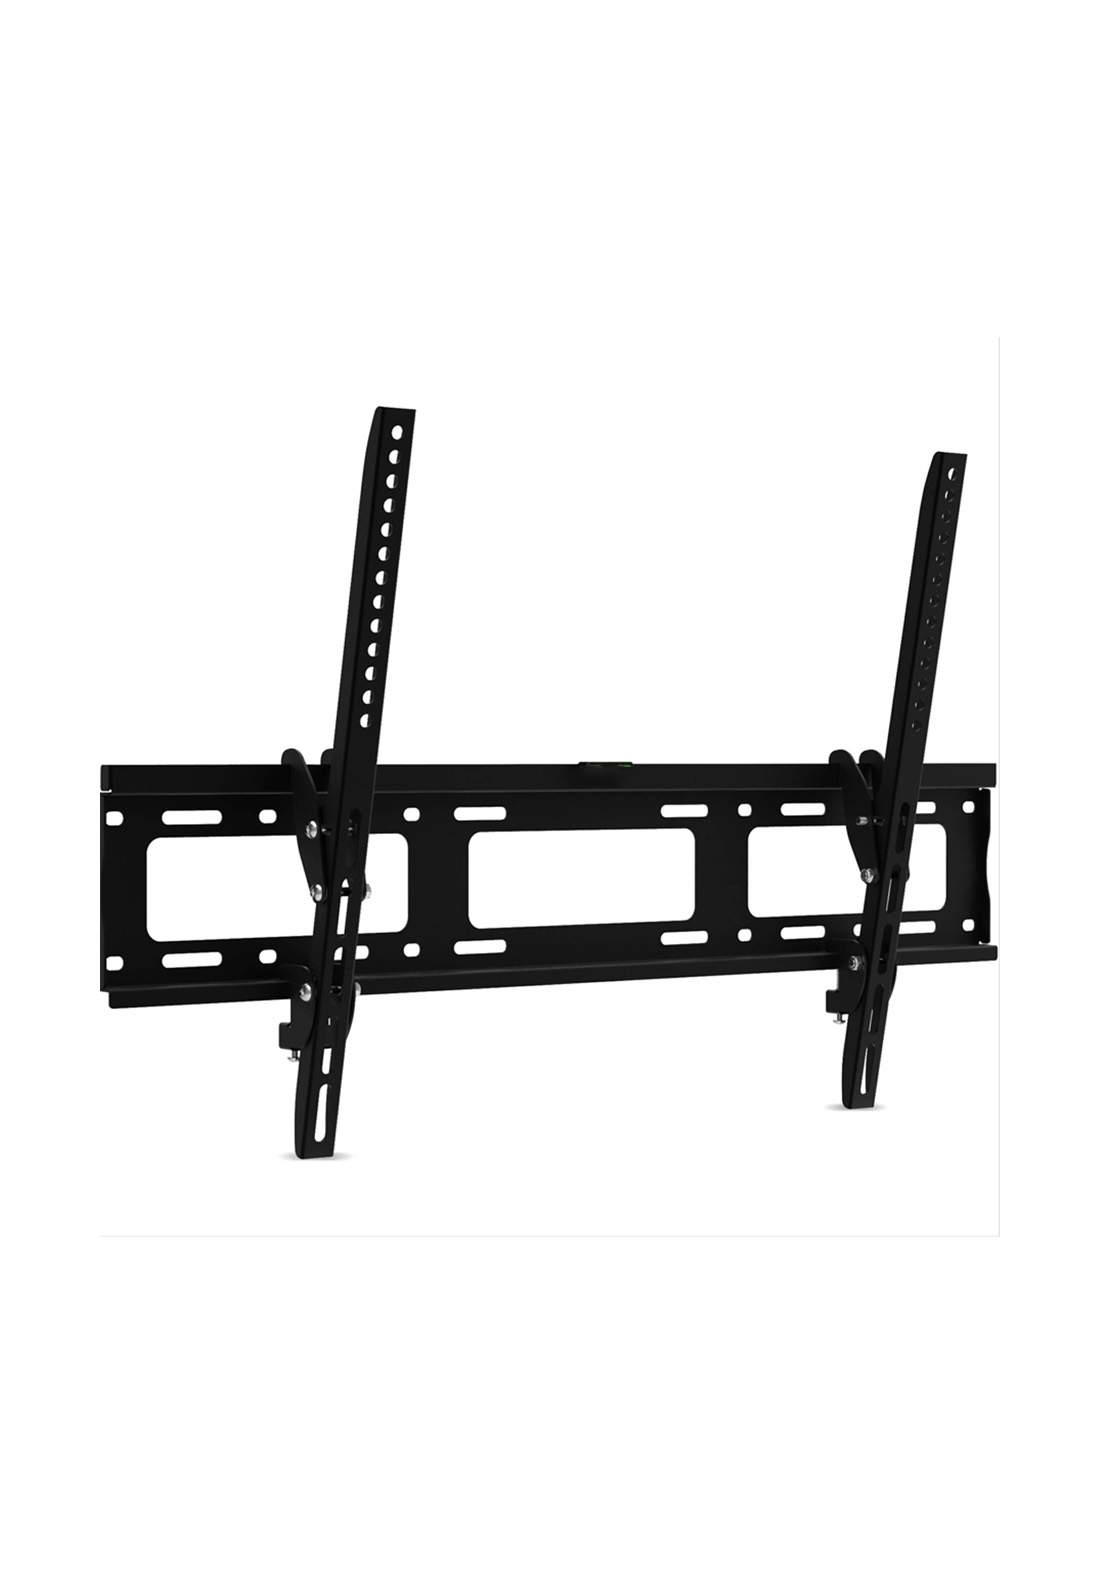 Strong  P1102 TV Wall Mount 26 - 55 Inch حاملة تلفزيون للحائط متحركة